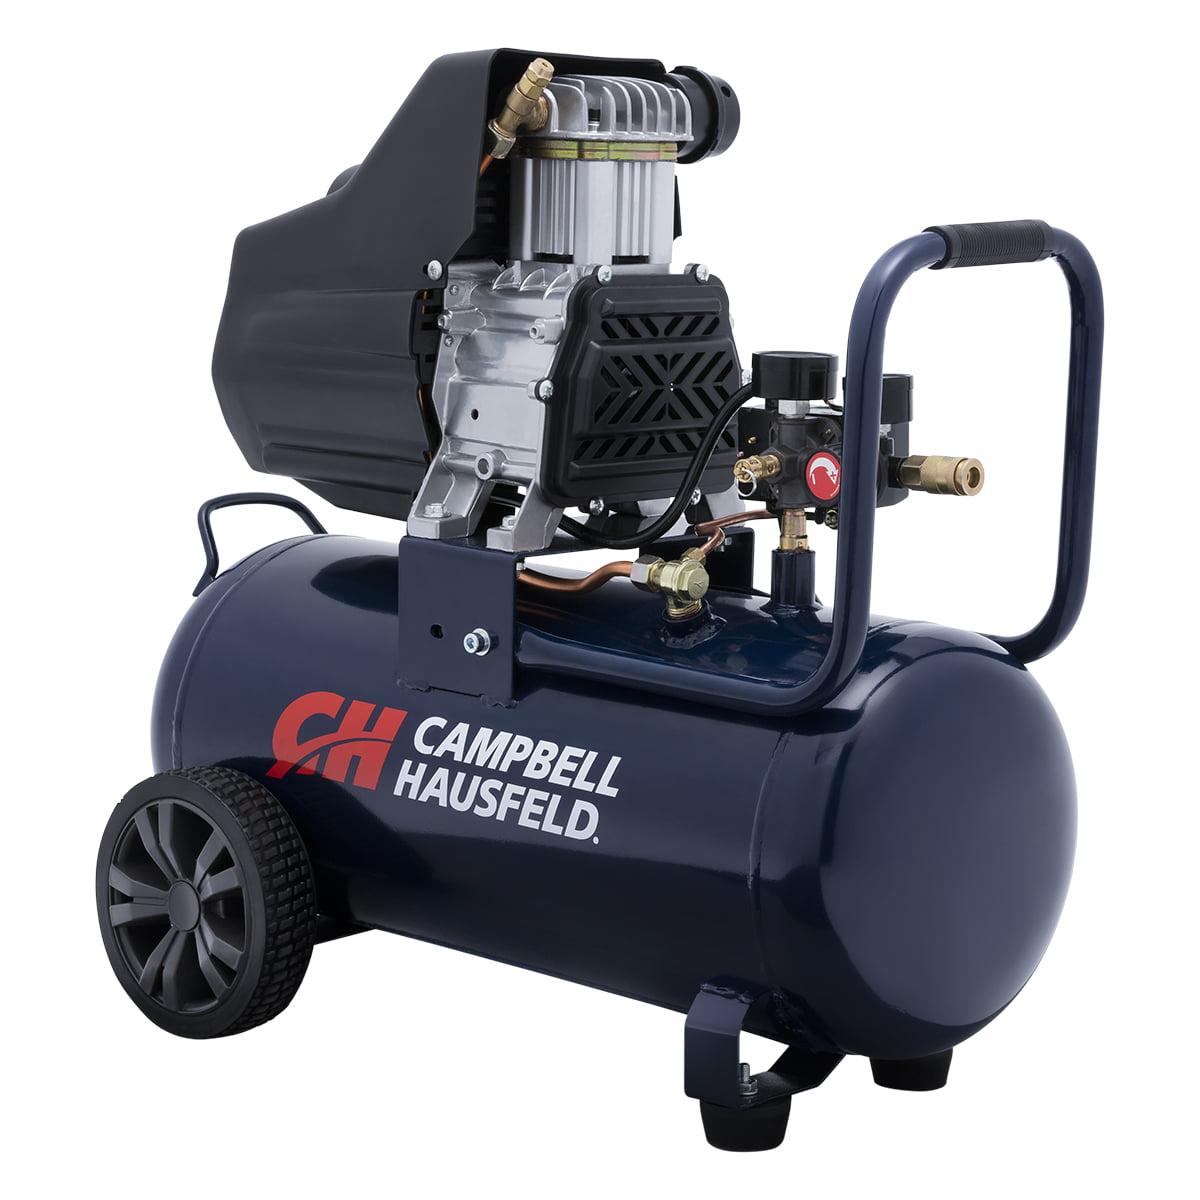 Campbell Hausfeld DC080100 8 Gallon 1.3HP Oil-Free Air Compressor